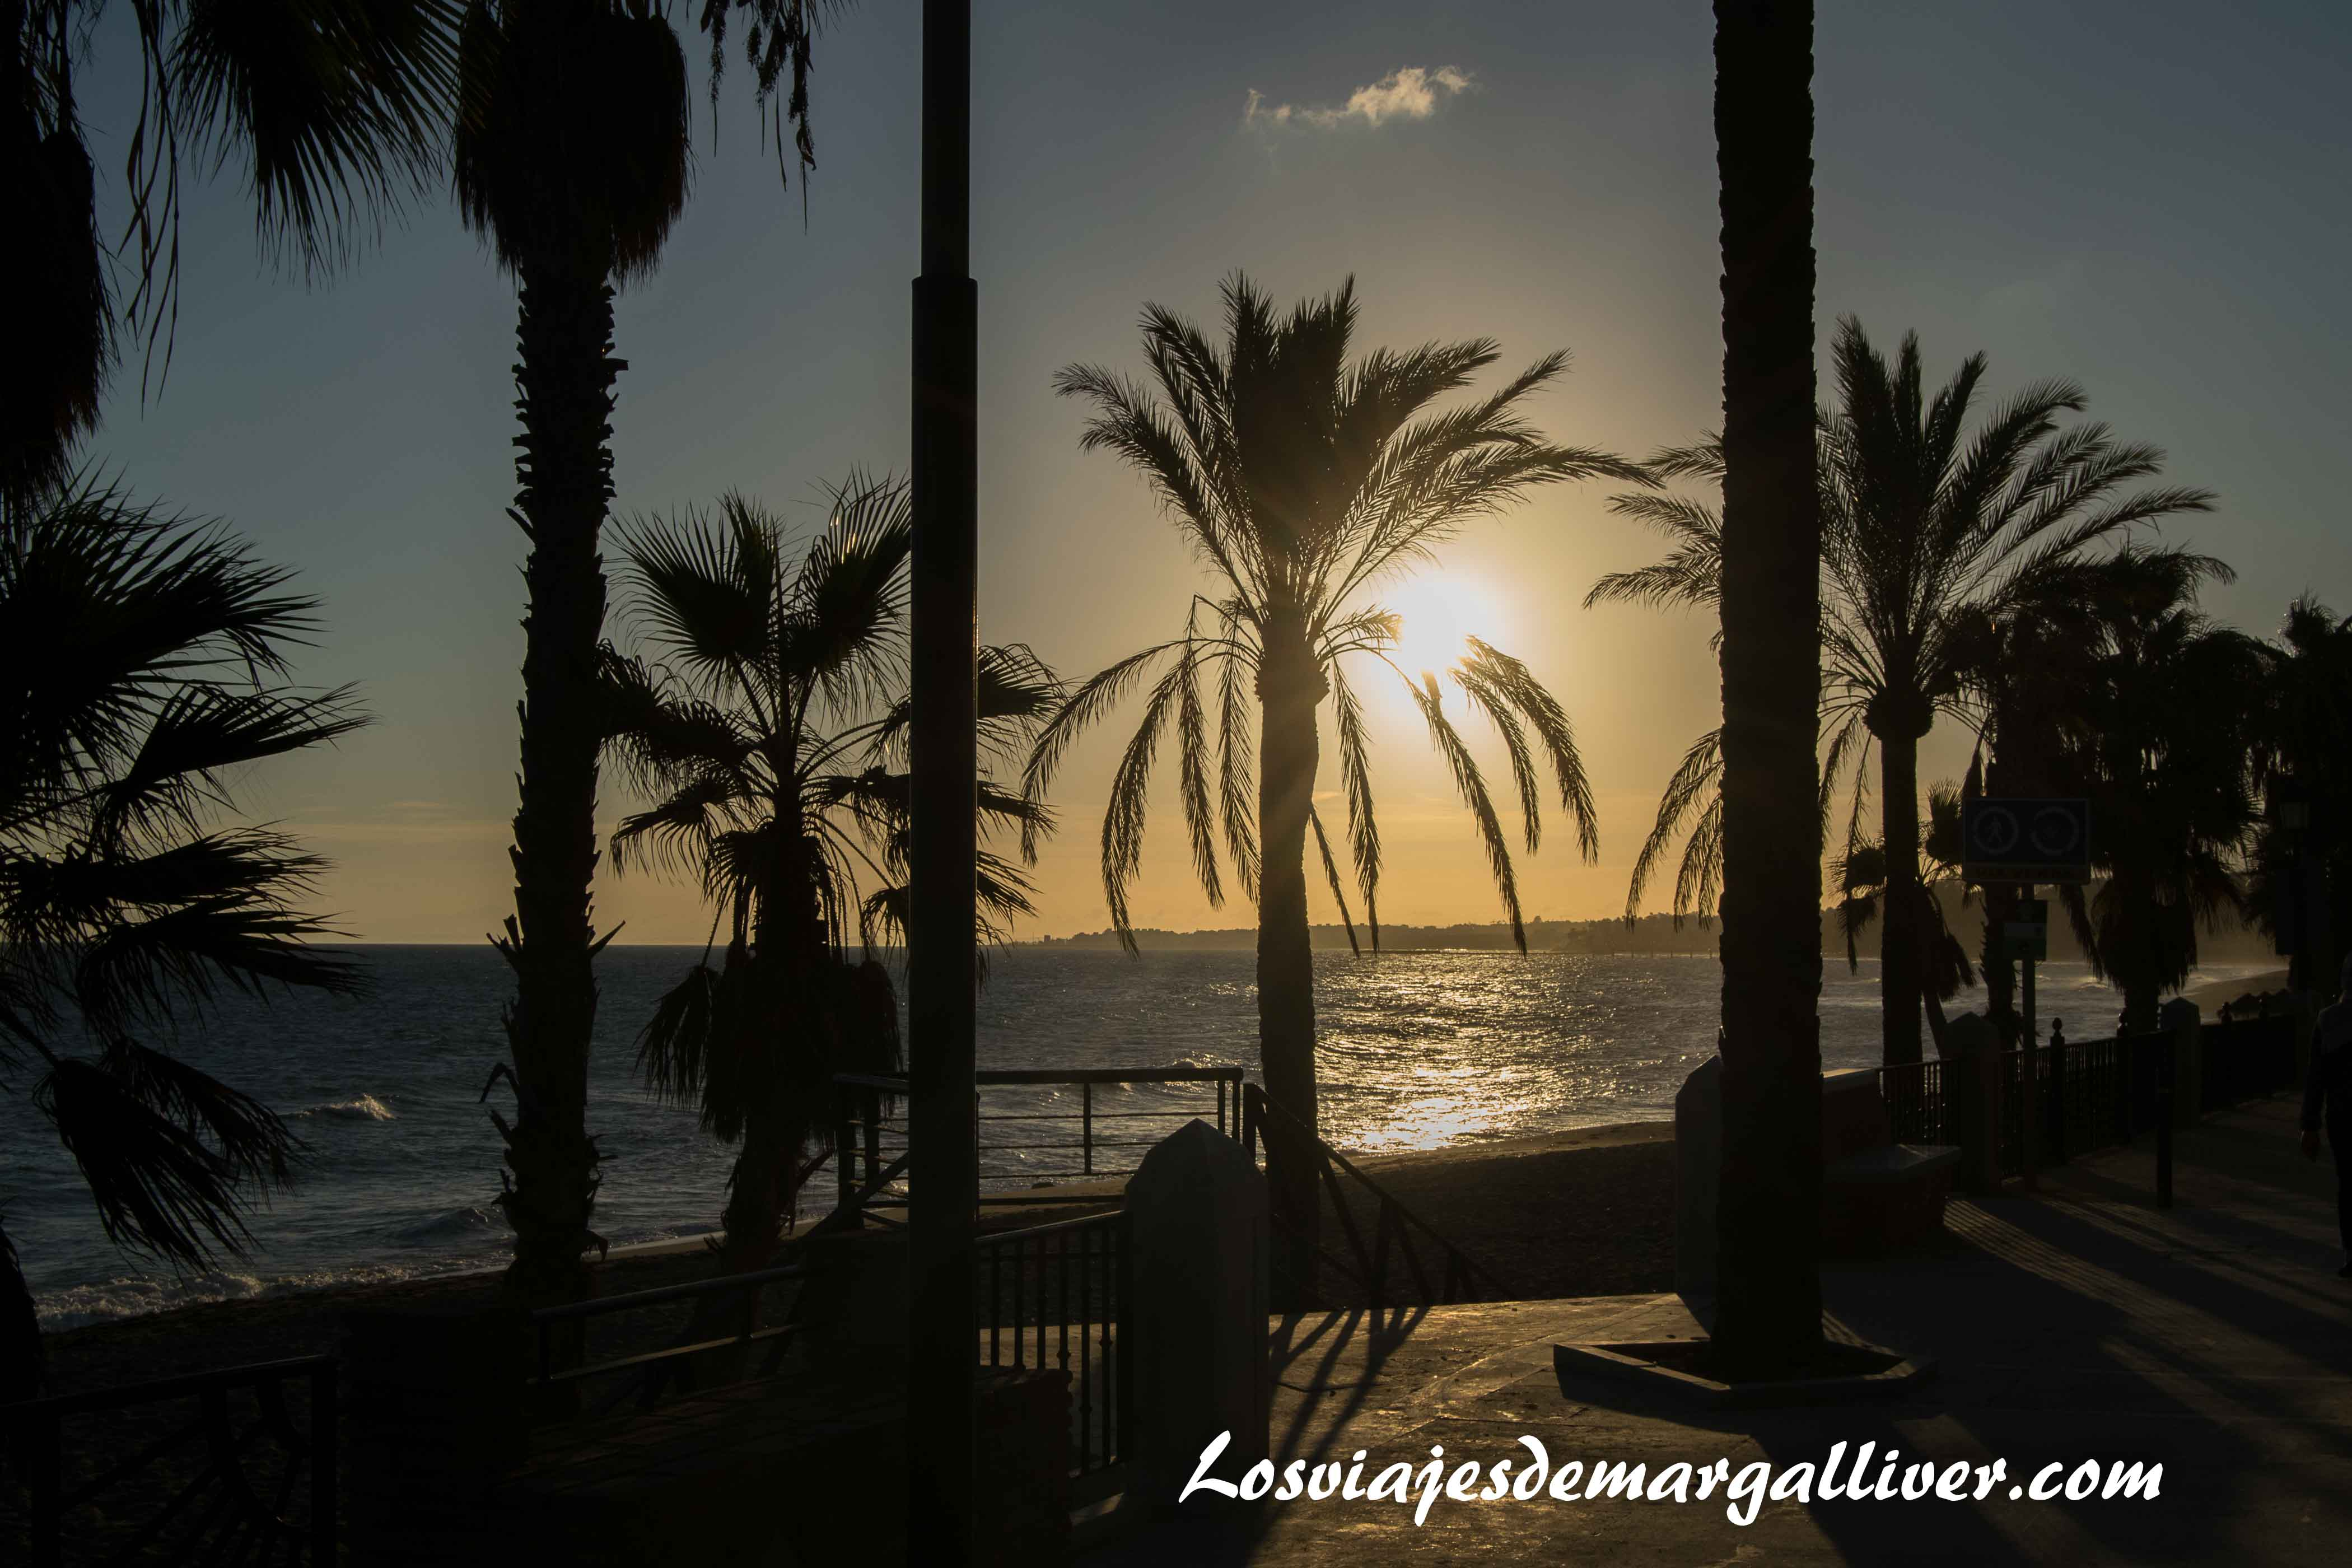 Atardecer en Marbella junto al paseo maritimo